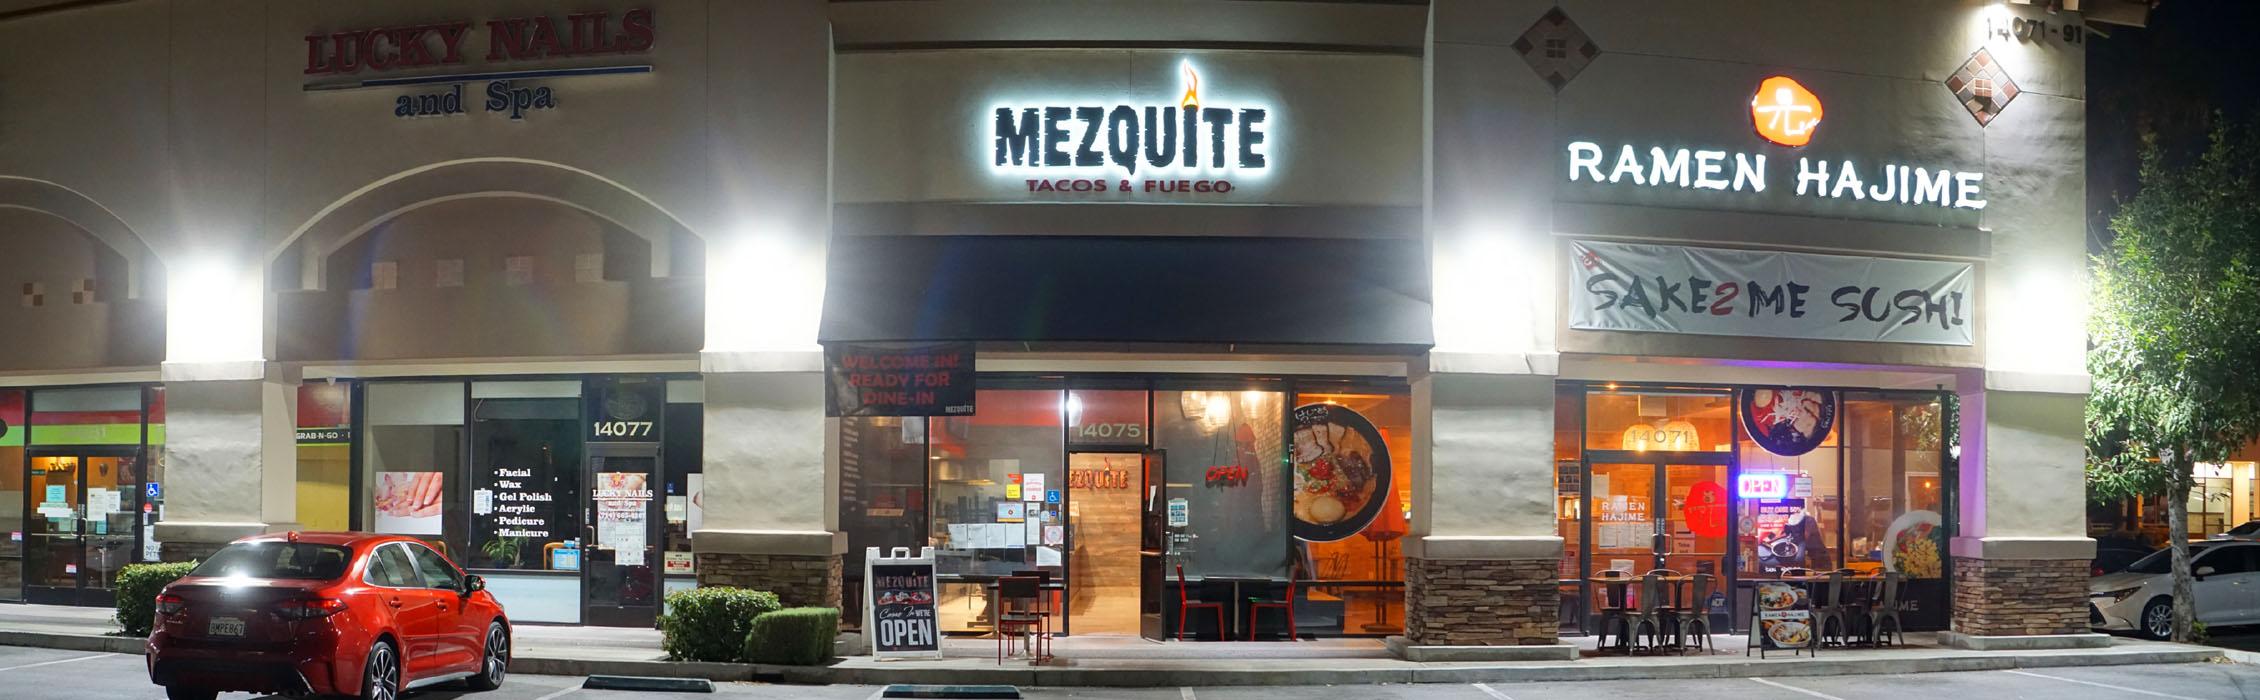 Mezquite Tacos & Fuego Exterior